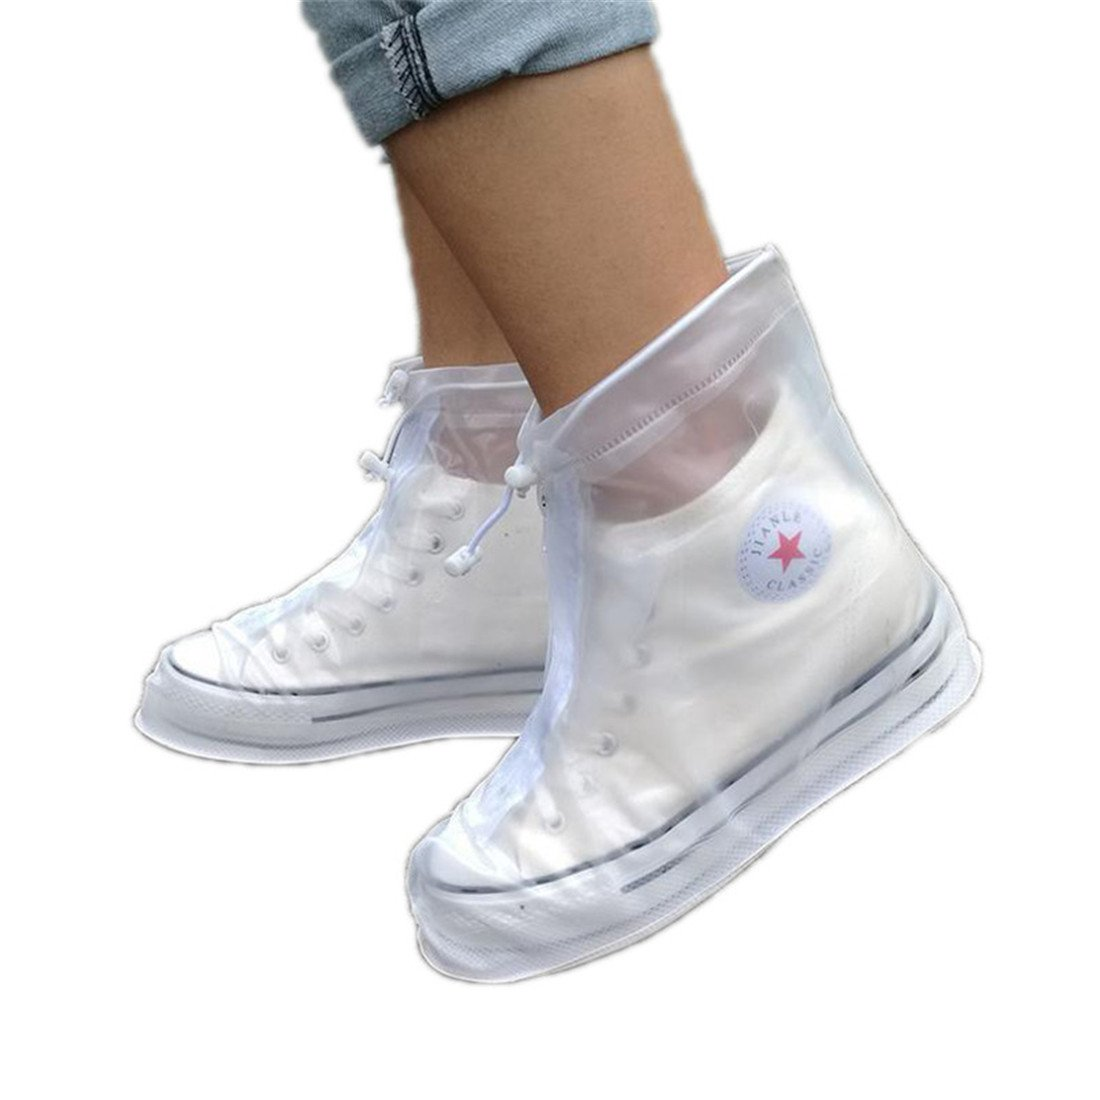 chicsoleil resistente al agua lluvia zapatos Covers reutilizable nieve, talla viaje lluvia Gear mujeres hombres